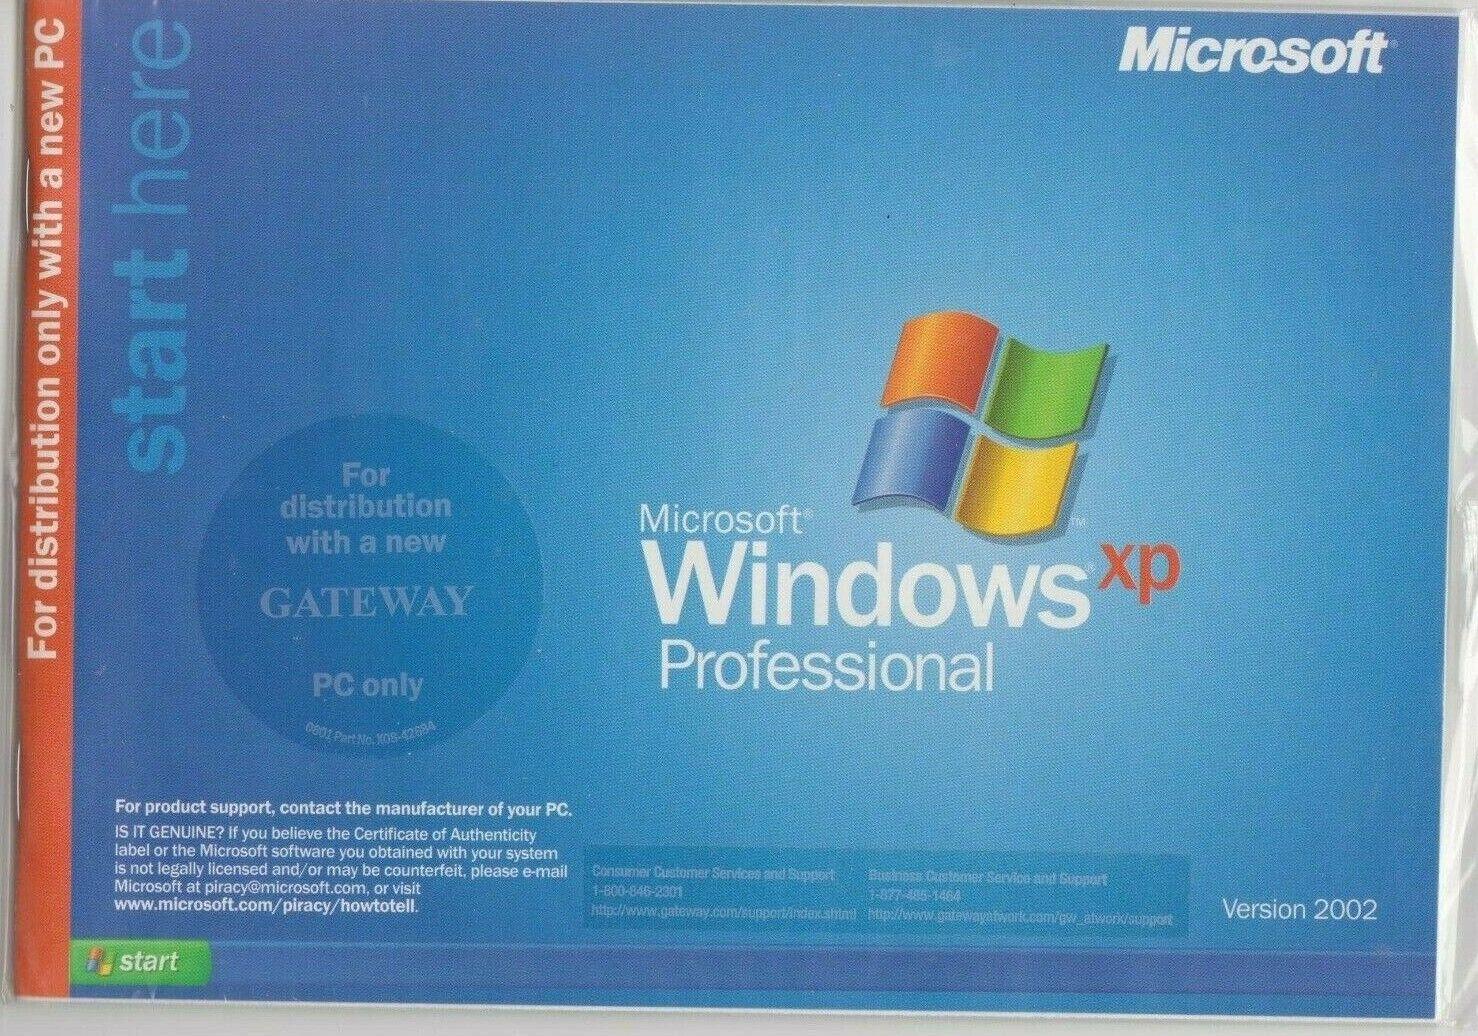 Gateway Operating System Windows XP Professional CD 7509595 V1.0 Sealed